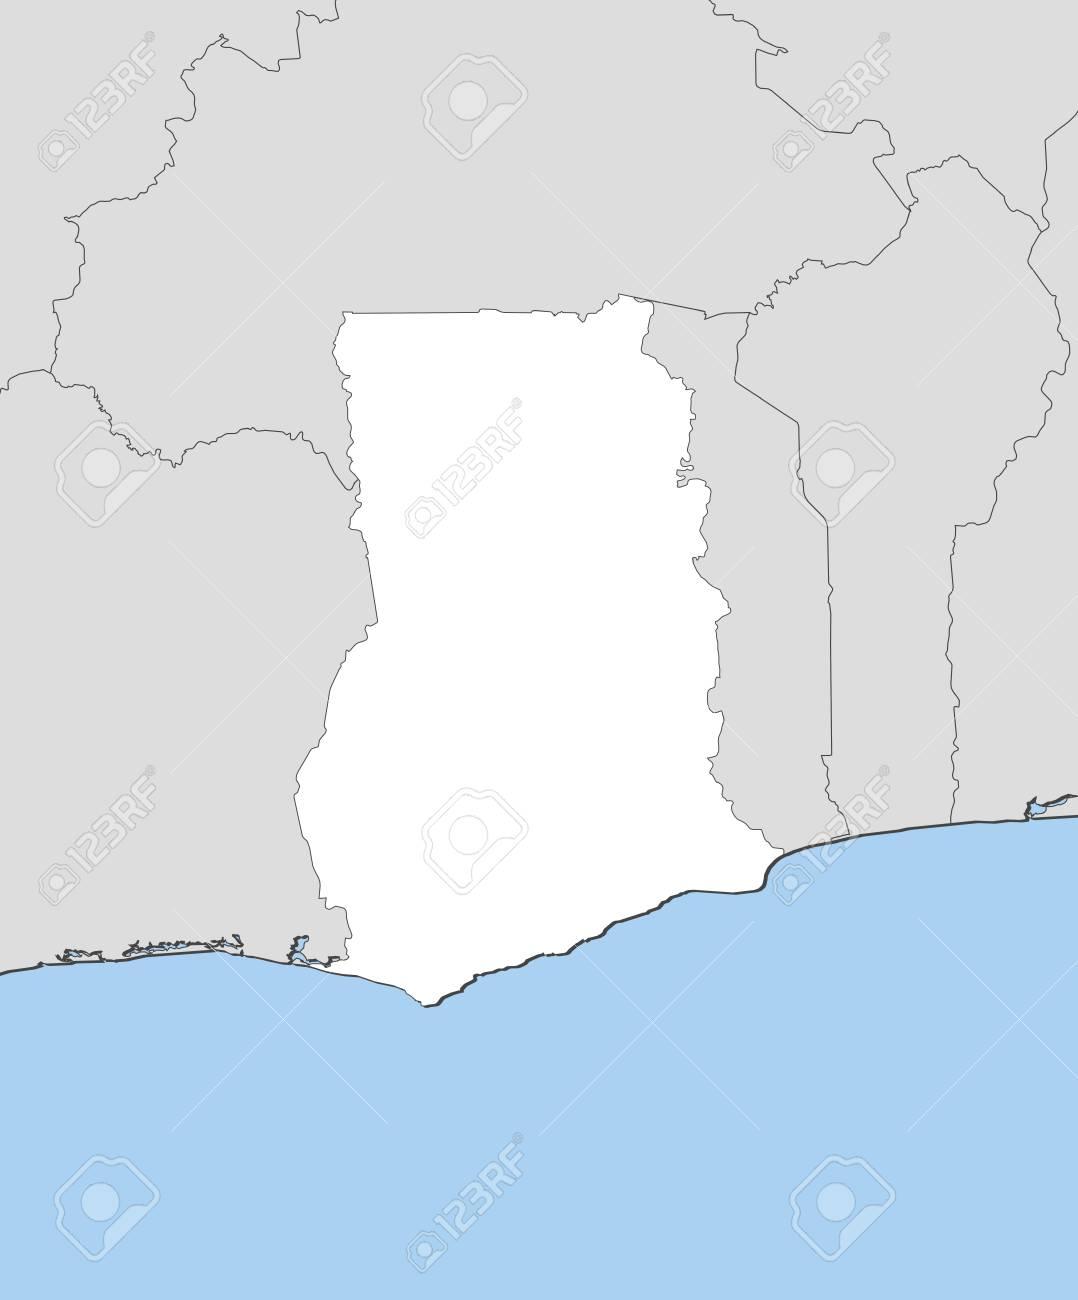 Ghana Karte.Stock Photo